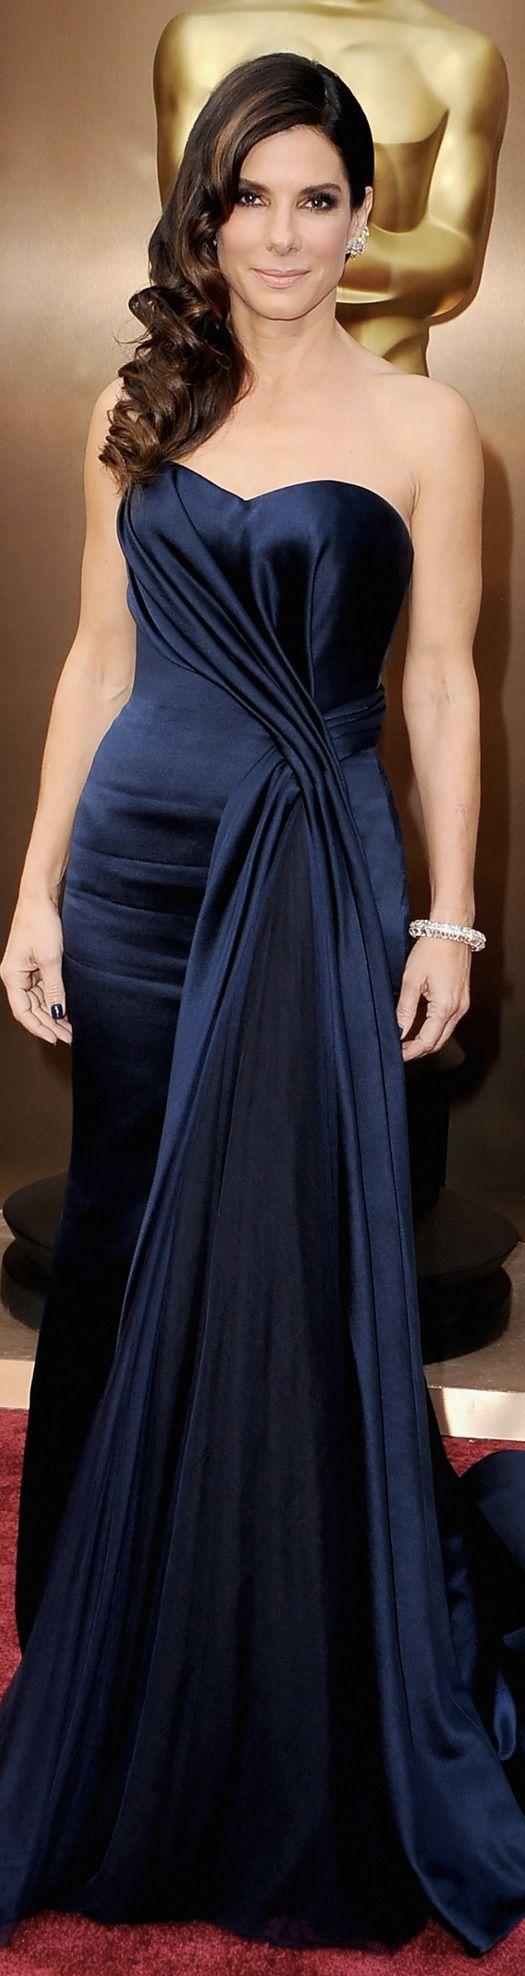 Sandra Bullock in Alexander McQueen | Oscars 2014